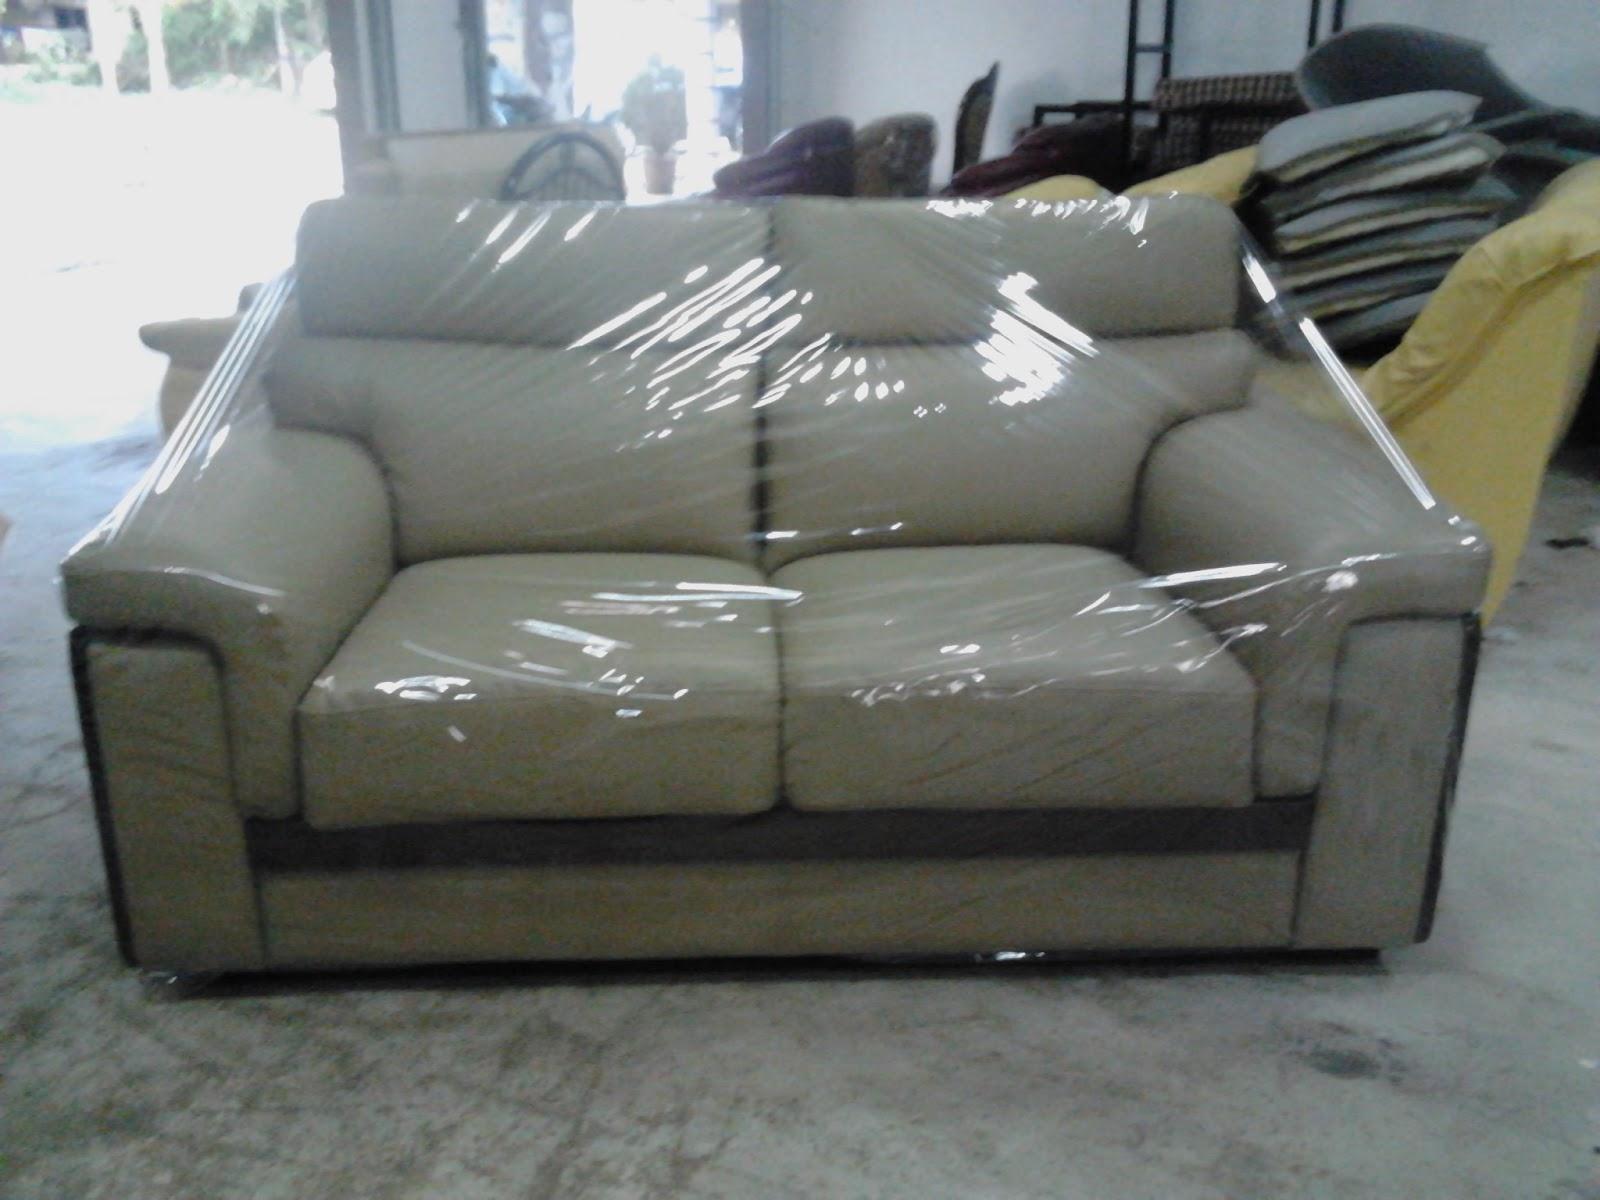 Repair Sofa Cushion Shah Alam Cheap Recliner Sets Murah Full Sectional Couch Tan With